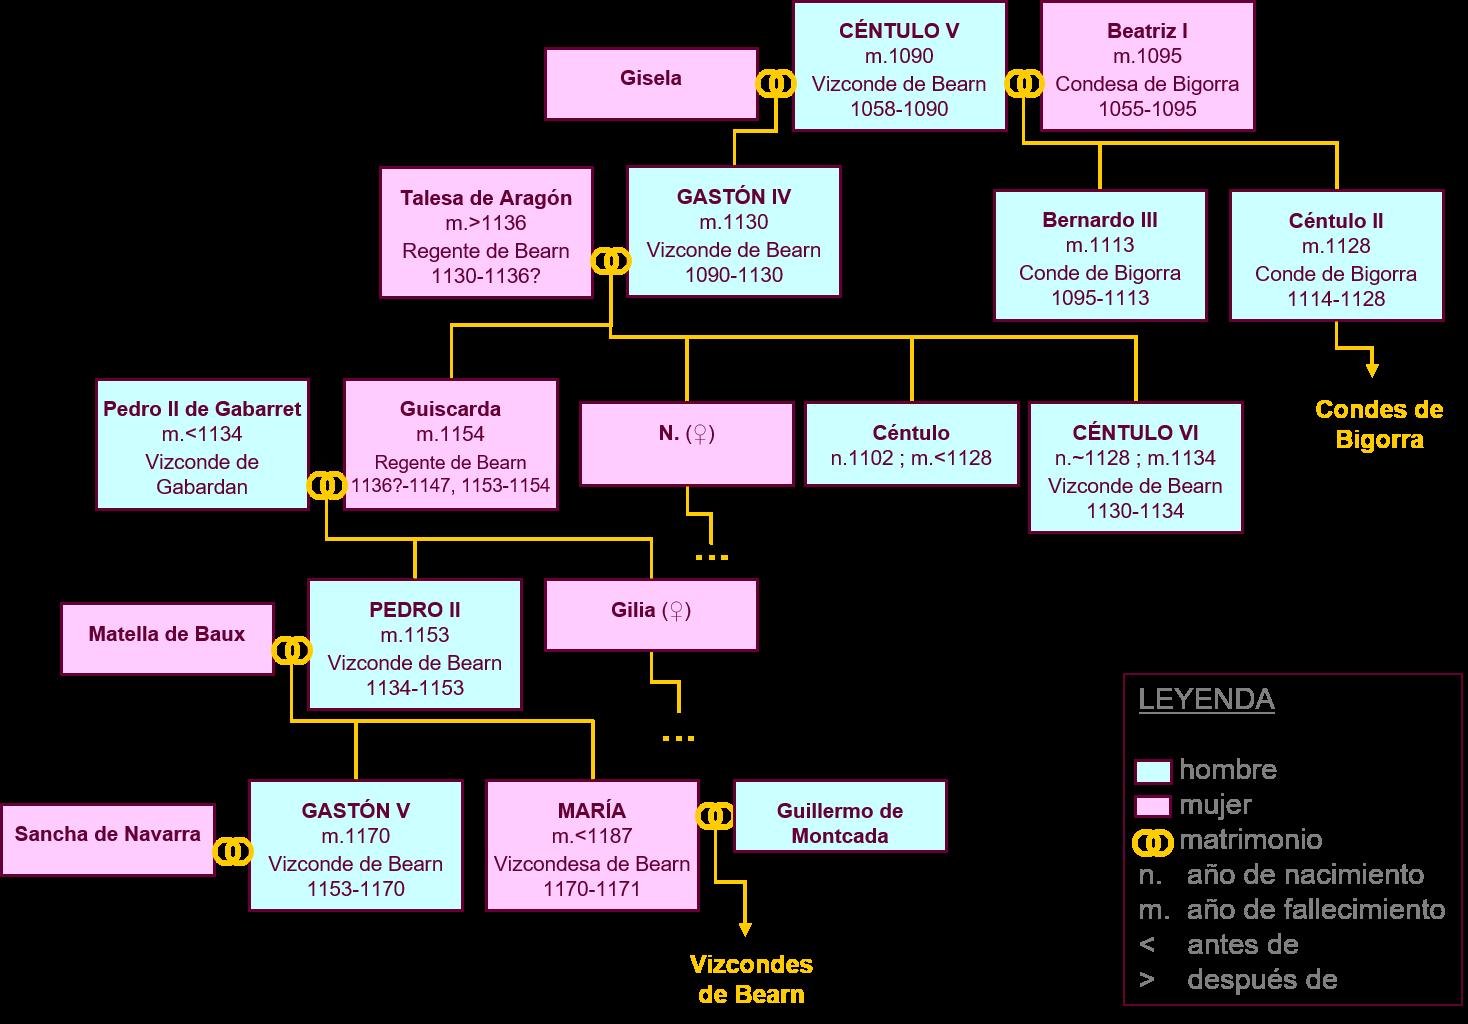 file arbol genealogico vizcondes bearn centulov maria